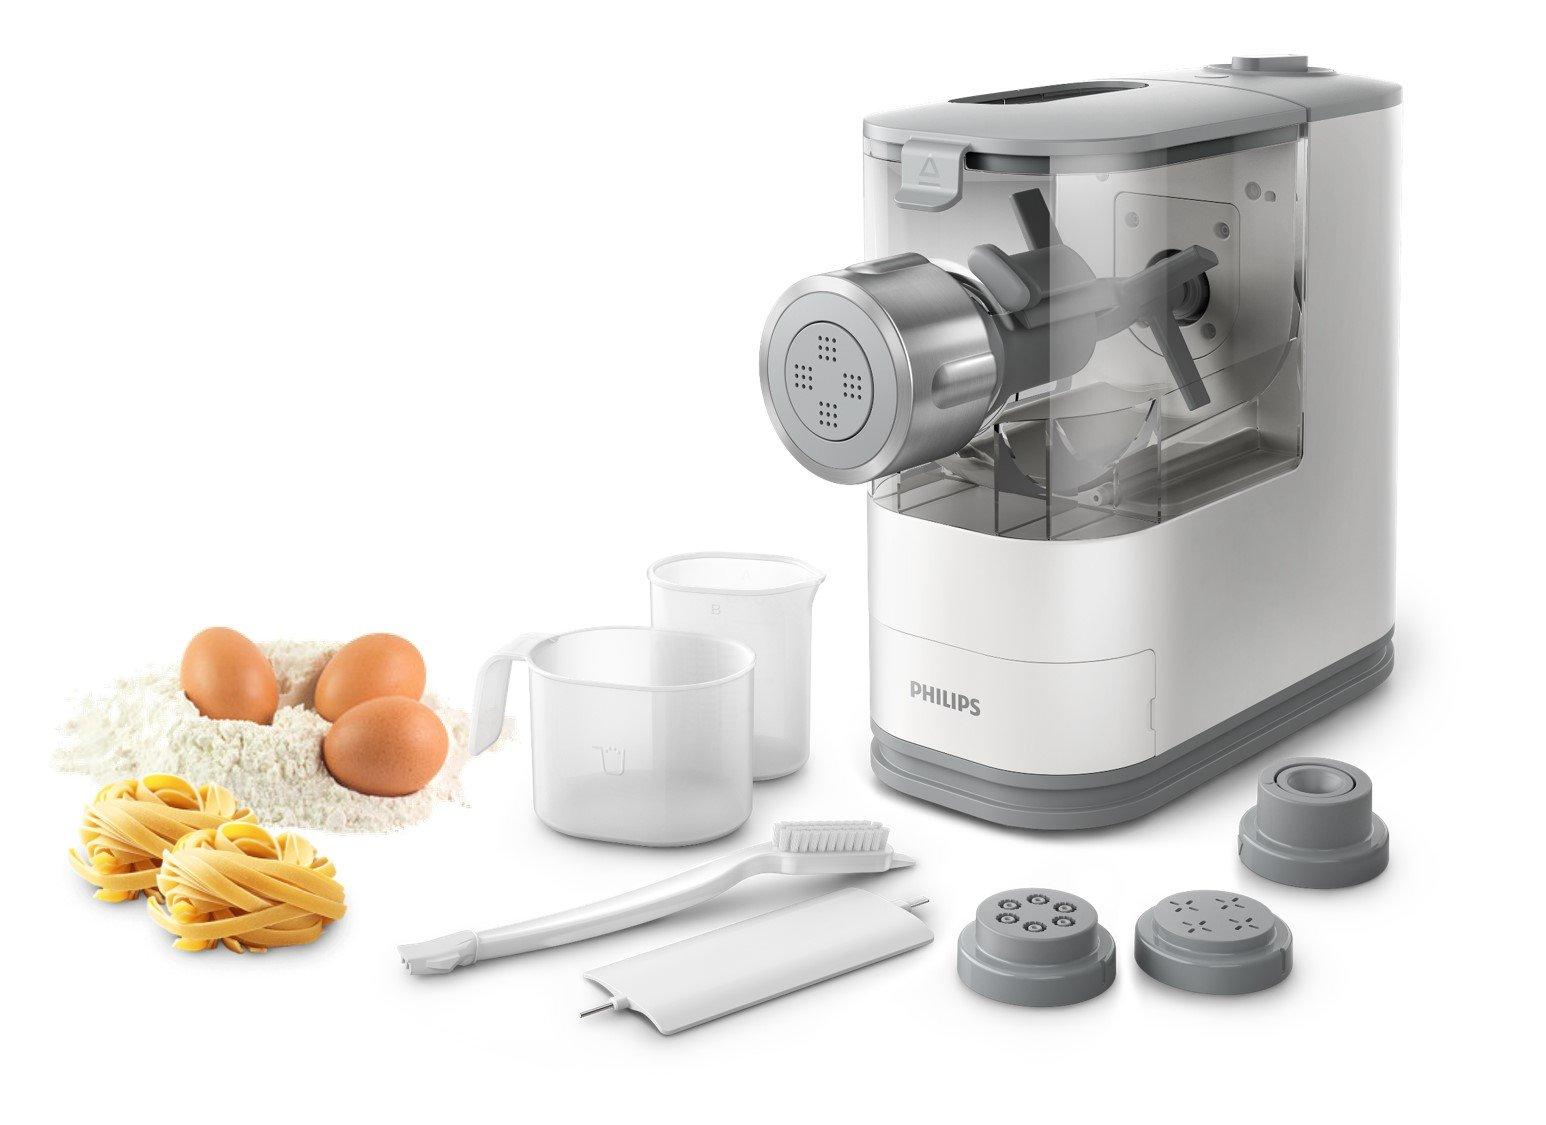 Philips HR2345/19 Viva Collection Pastamaker 150 W, Bianco 1 spesavip